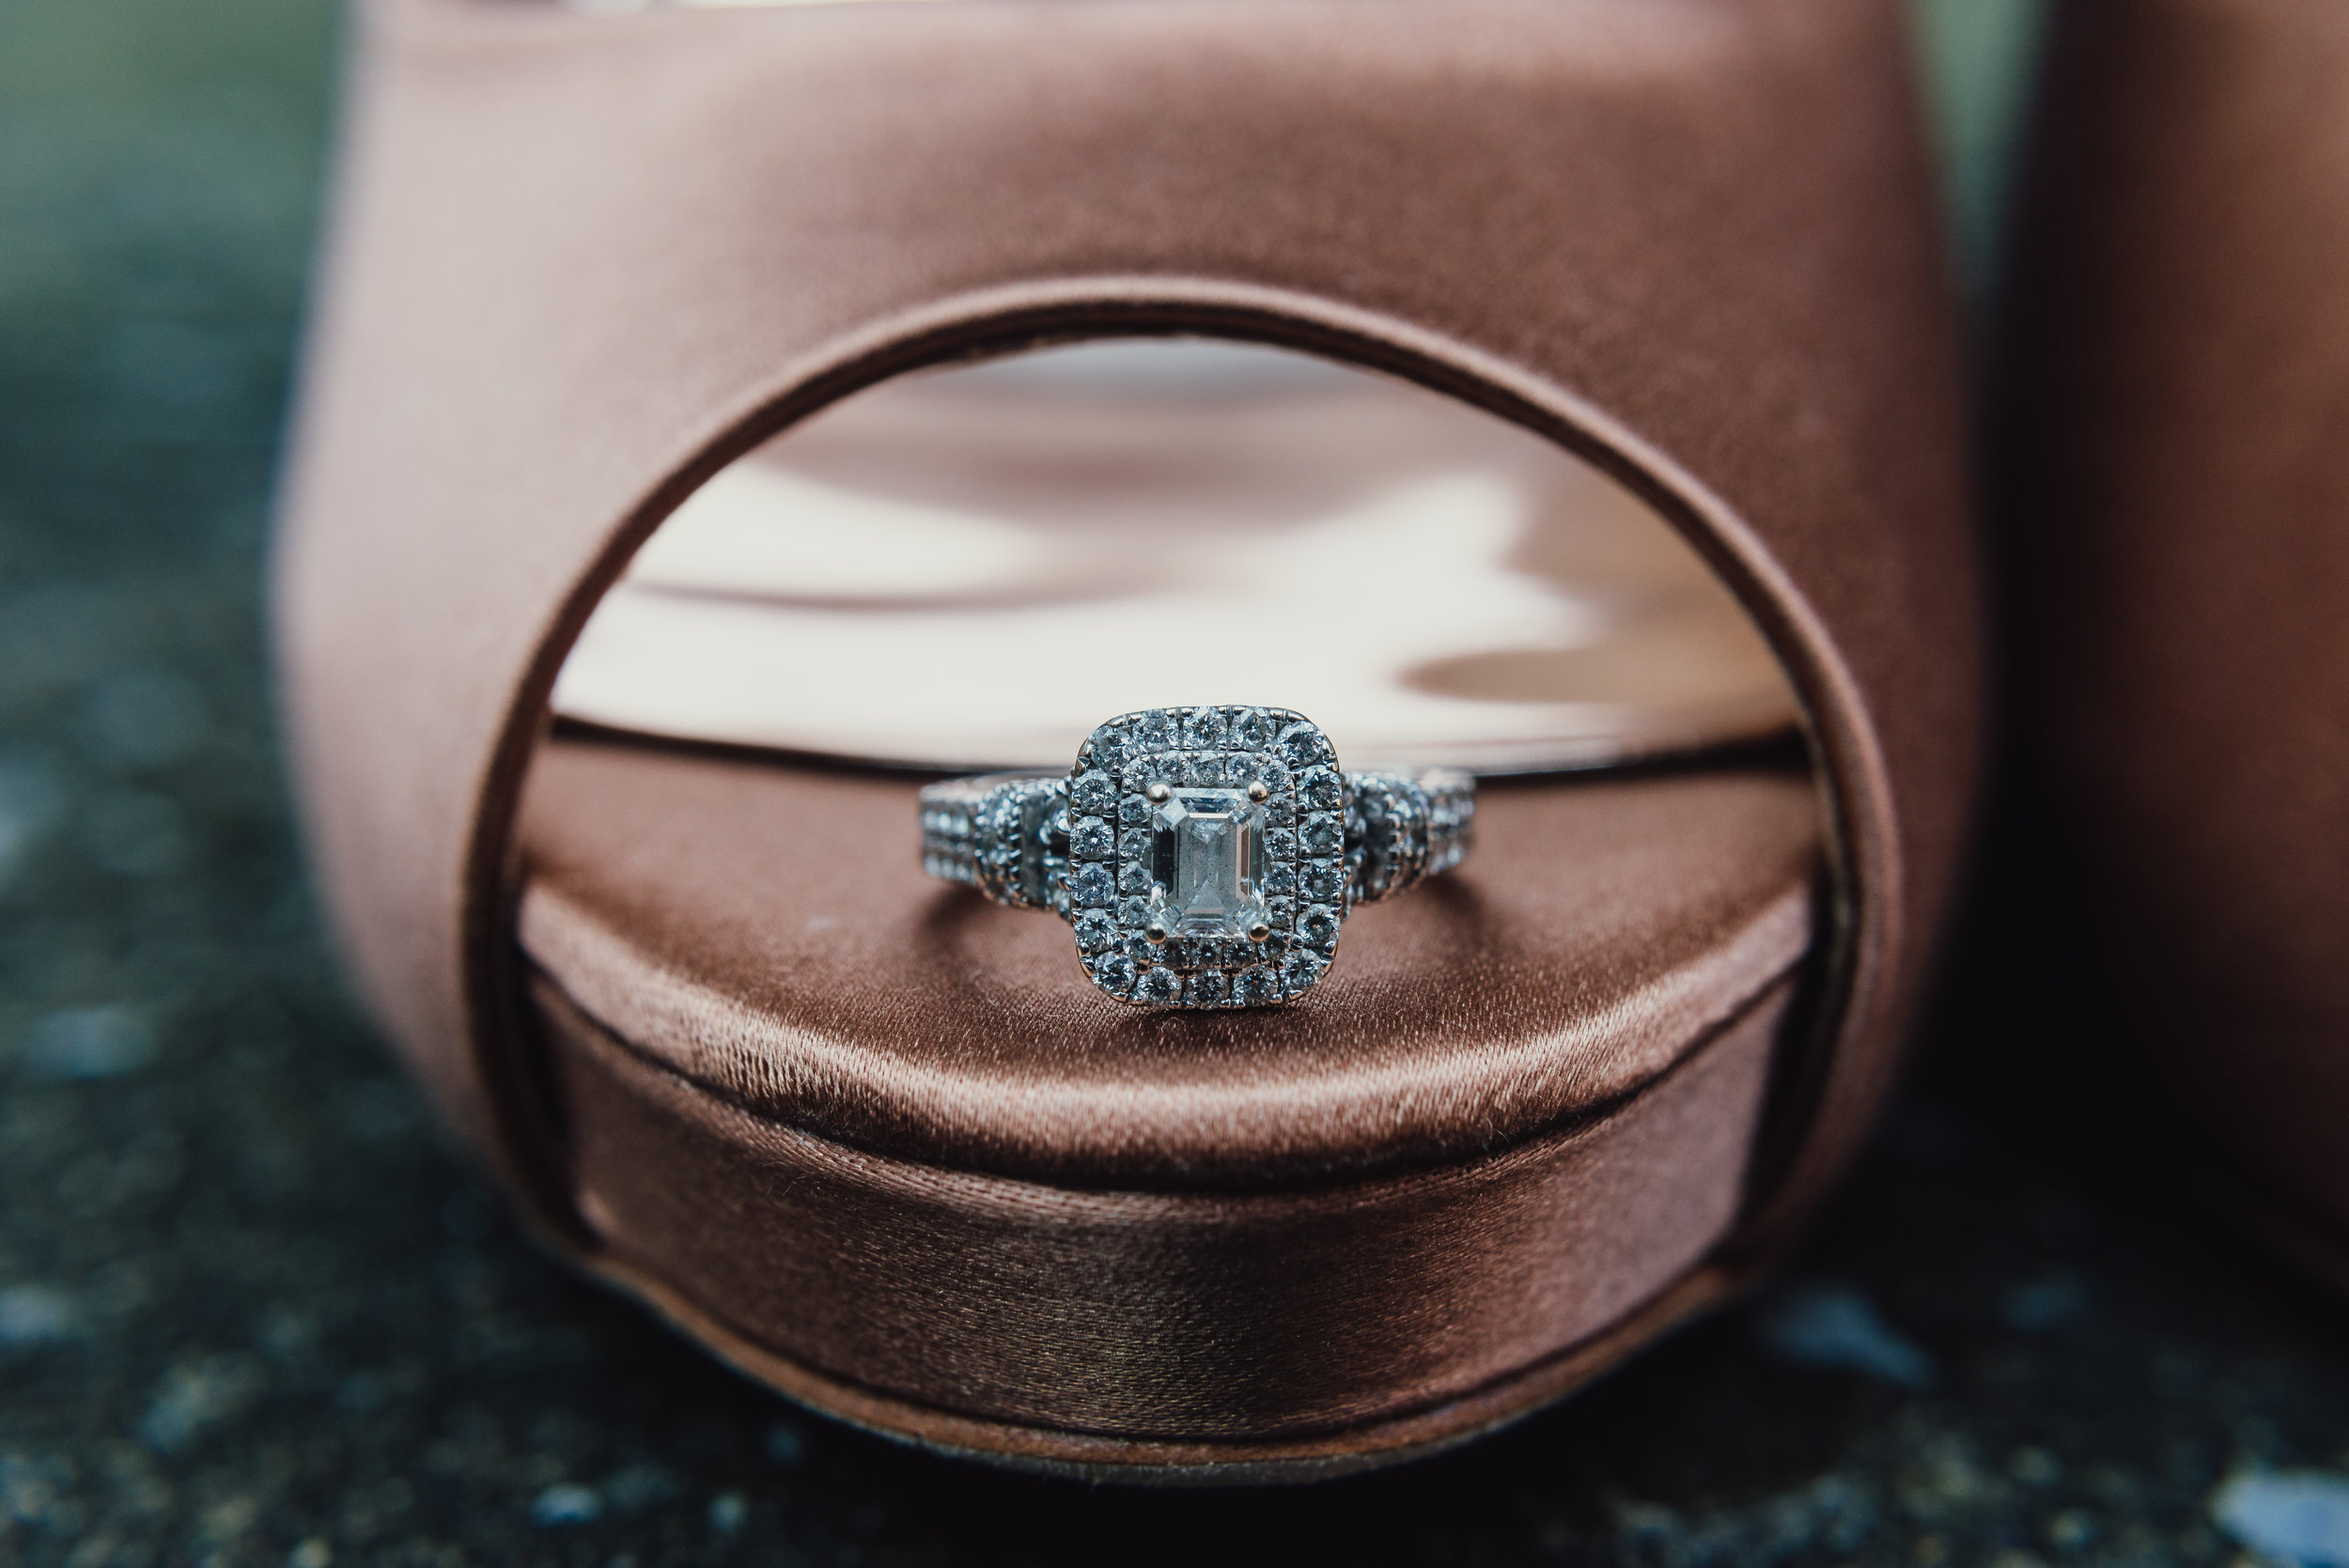 east-tn-wedding-photographer-tennessee-elopement-photographer-kingsport-tn-wedding-photographer (8 of 32).jpg